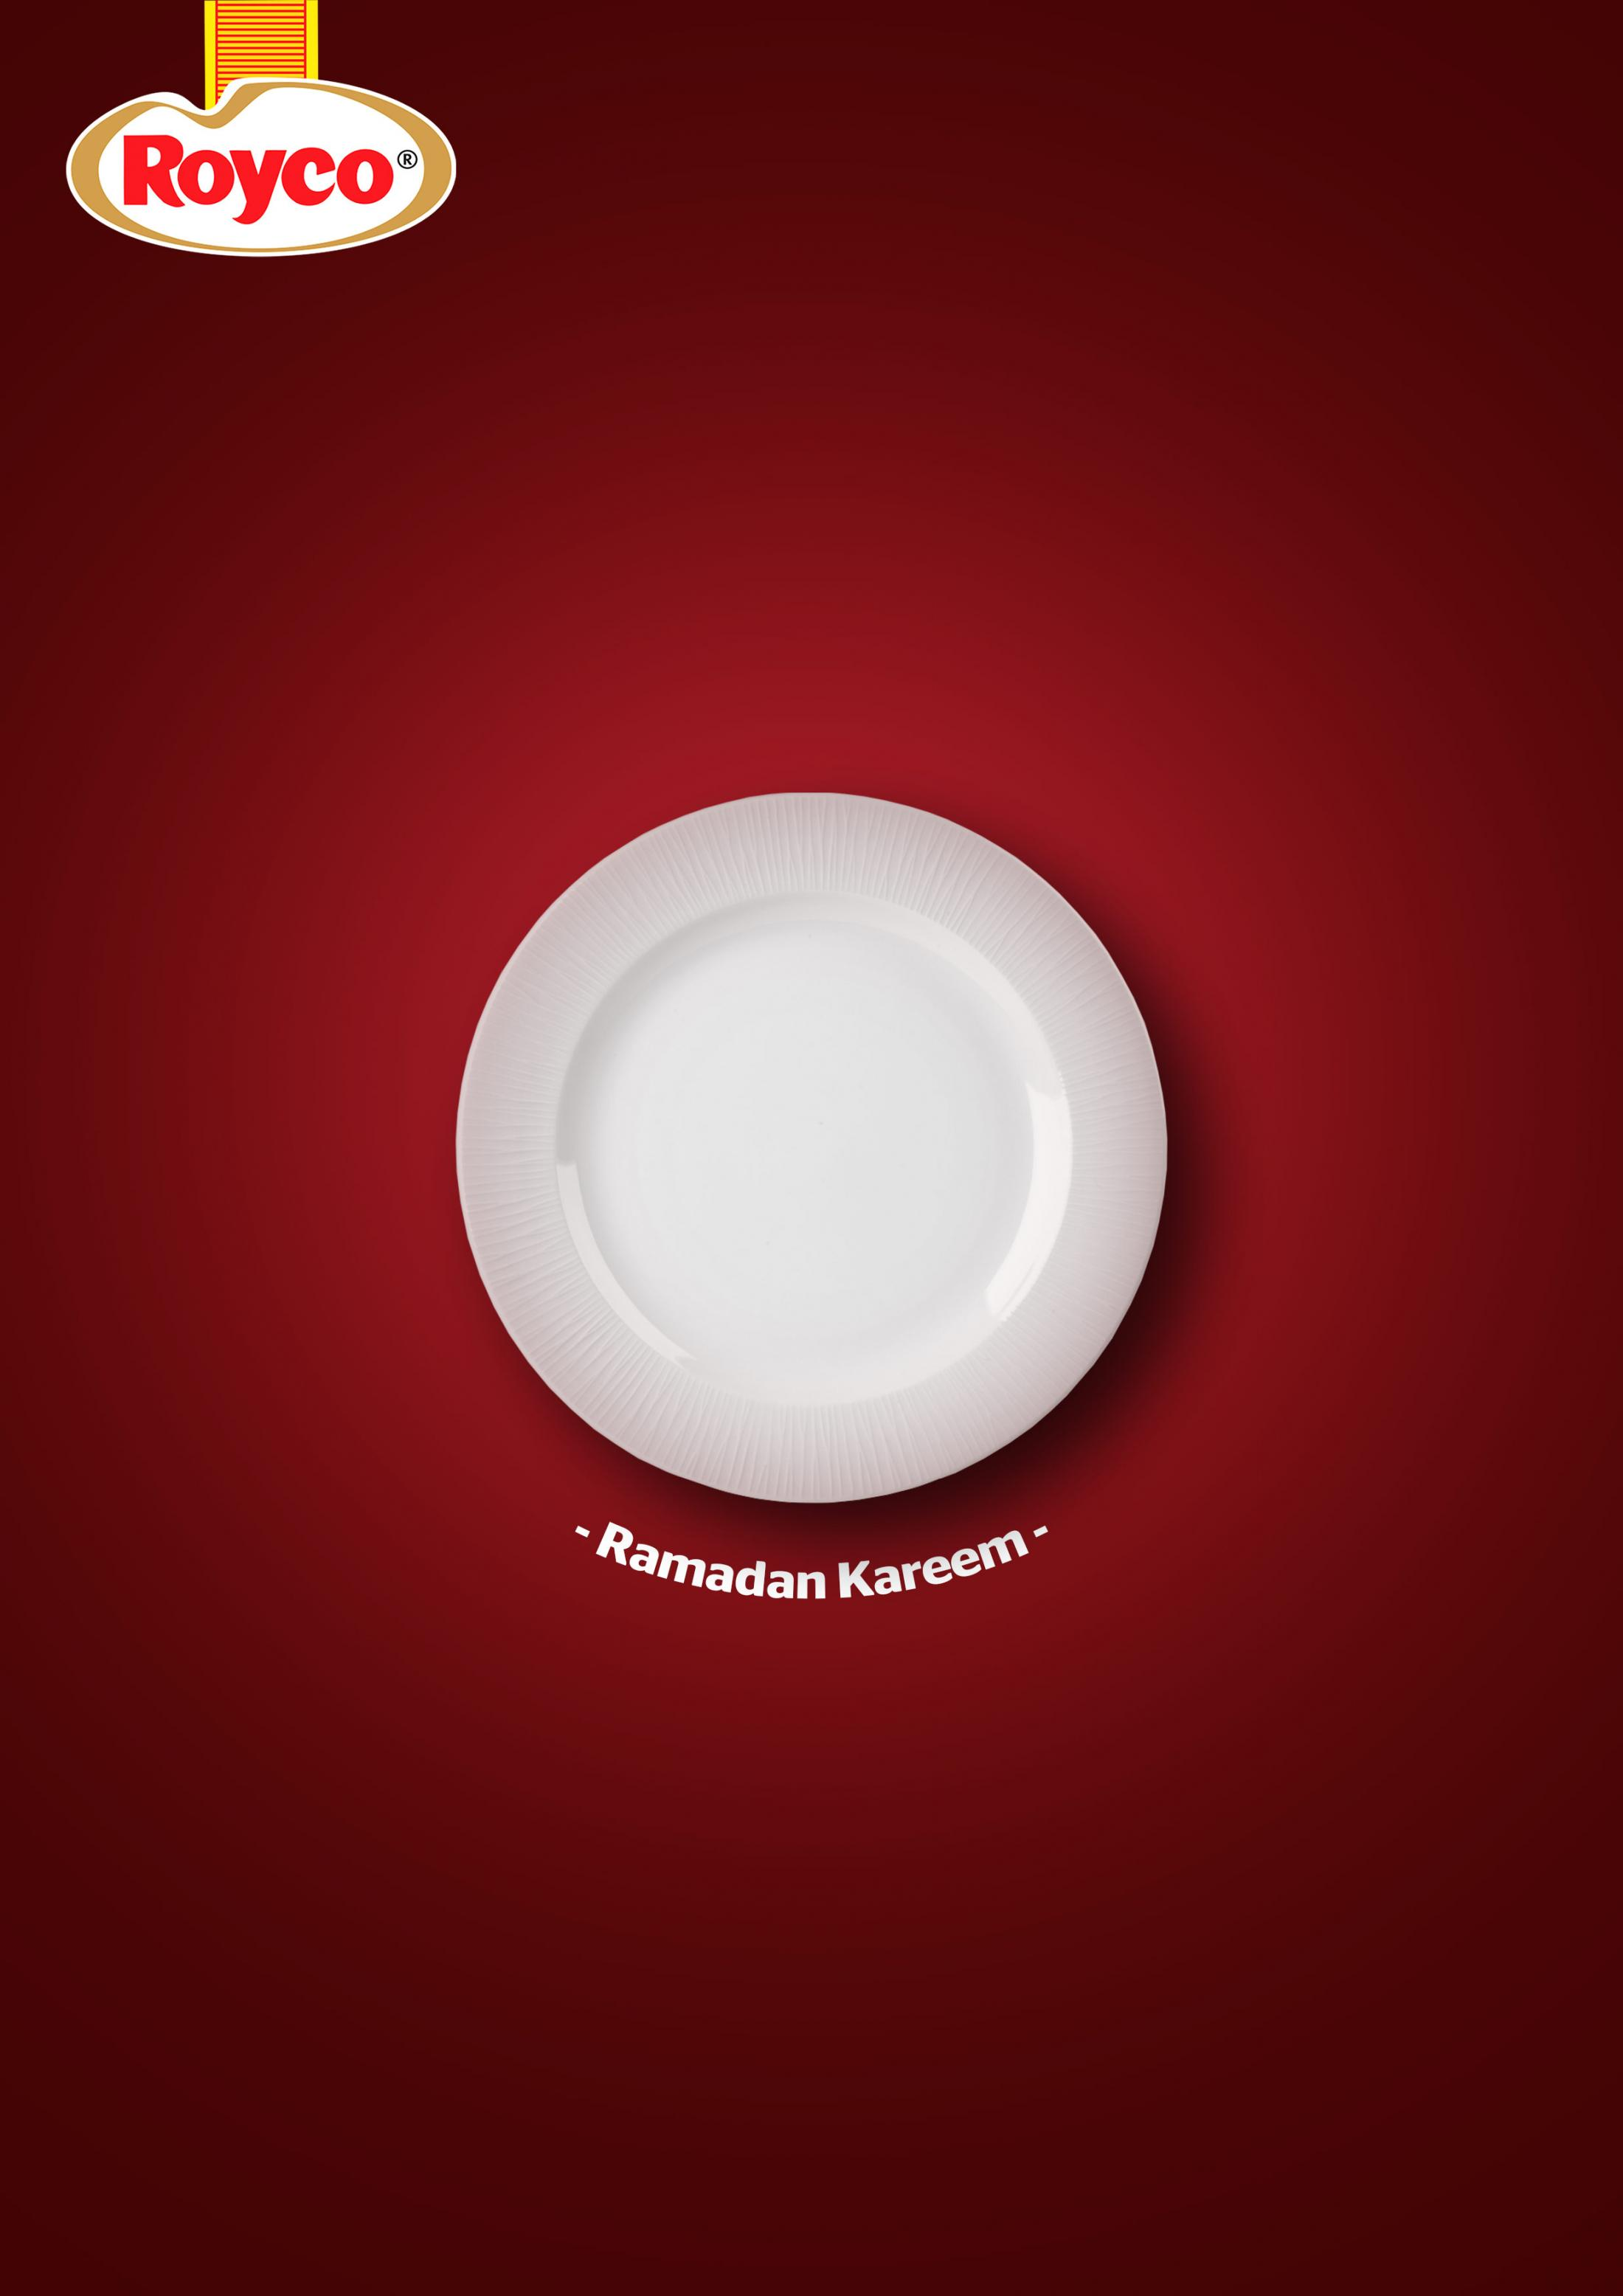 Royco Print Ad - Ramadan Kareem, 2